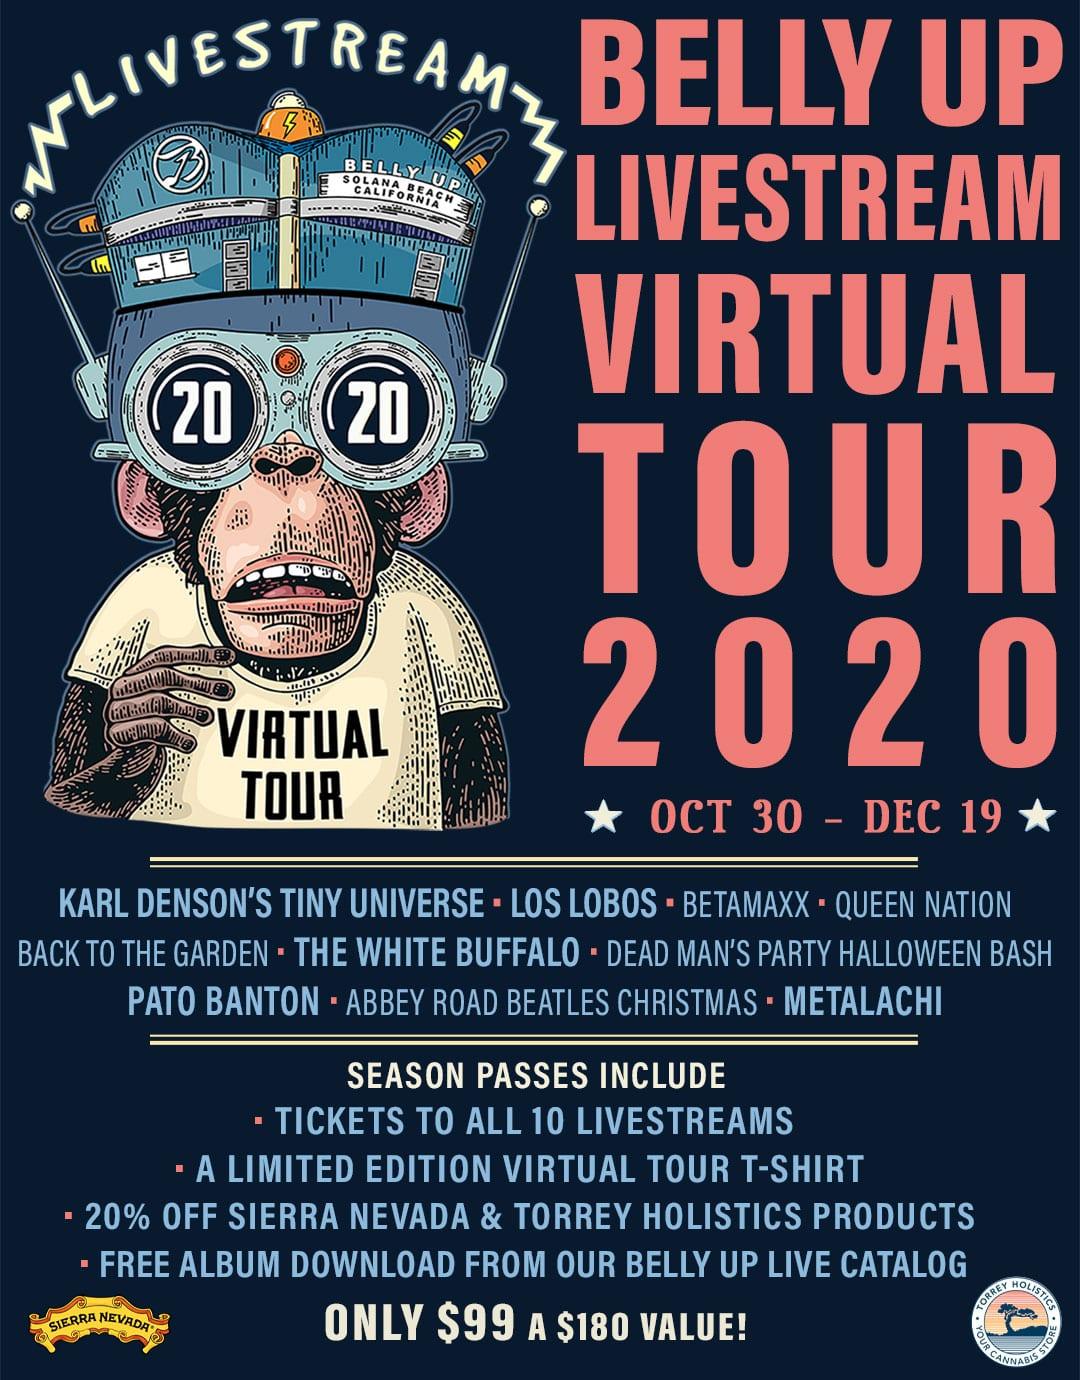 Belly Up Livestream Virtual Tour 2020